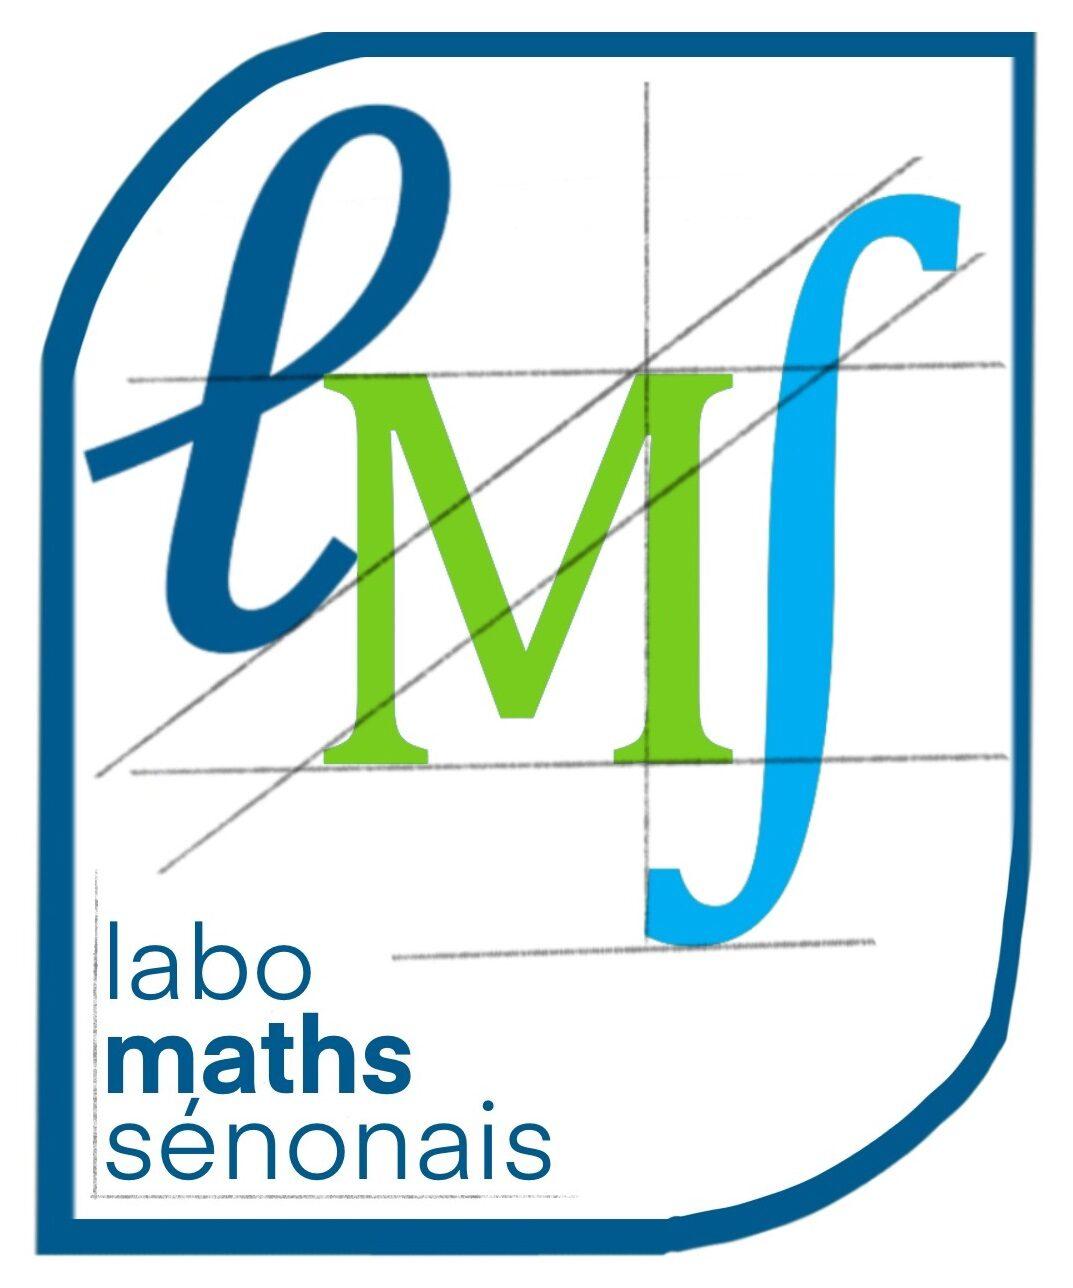 grand_logo.JPG